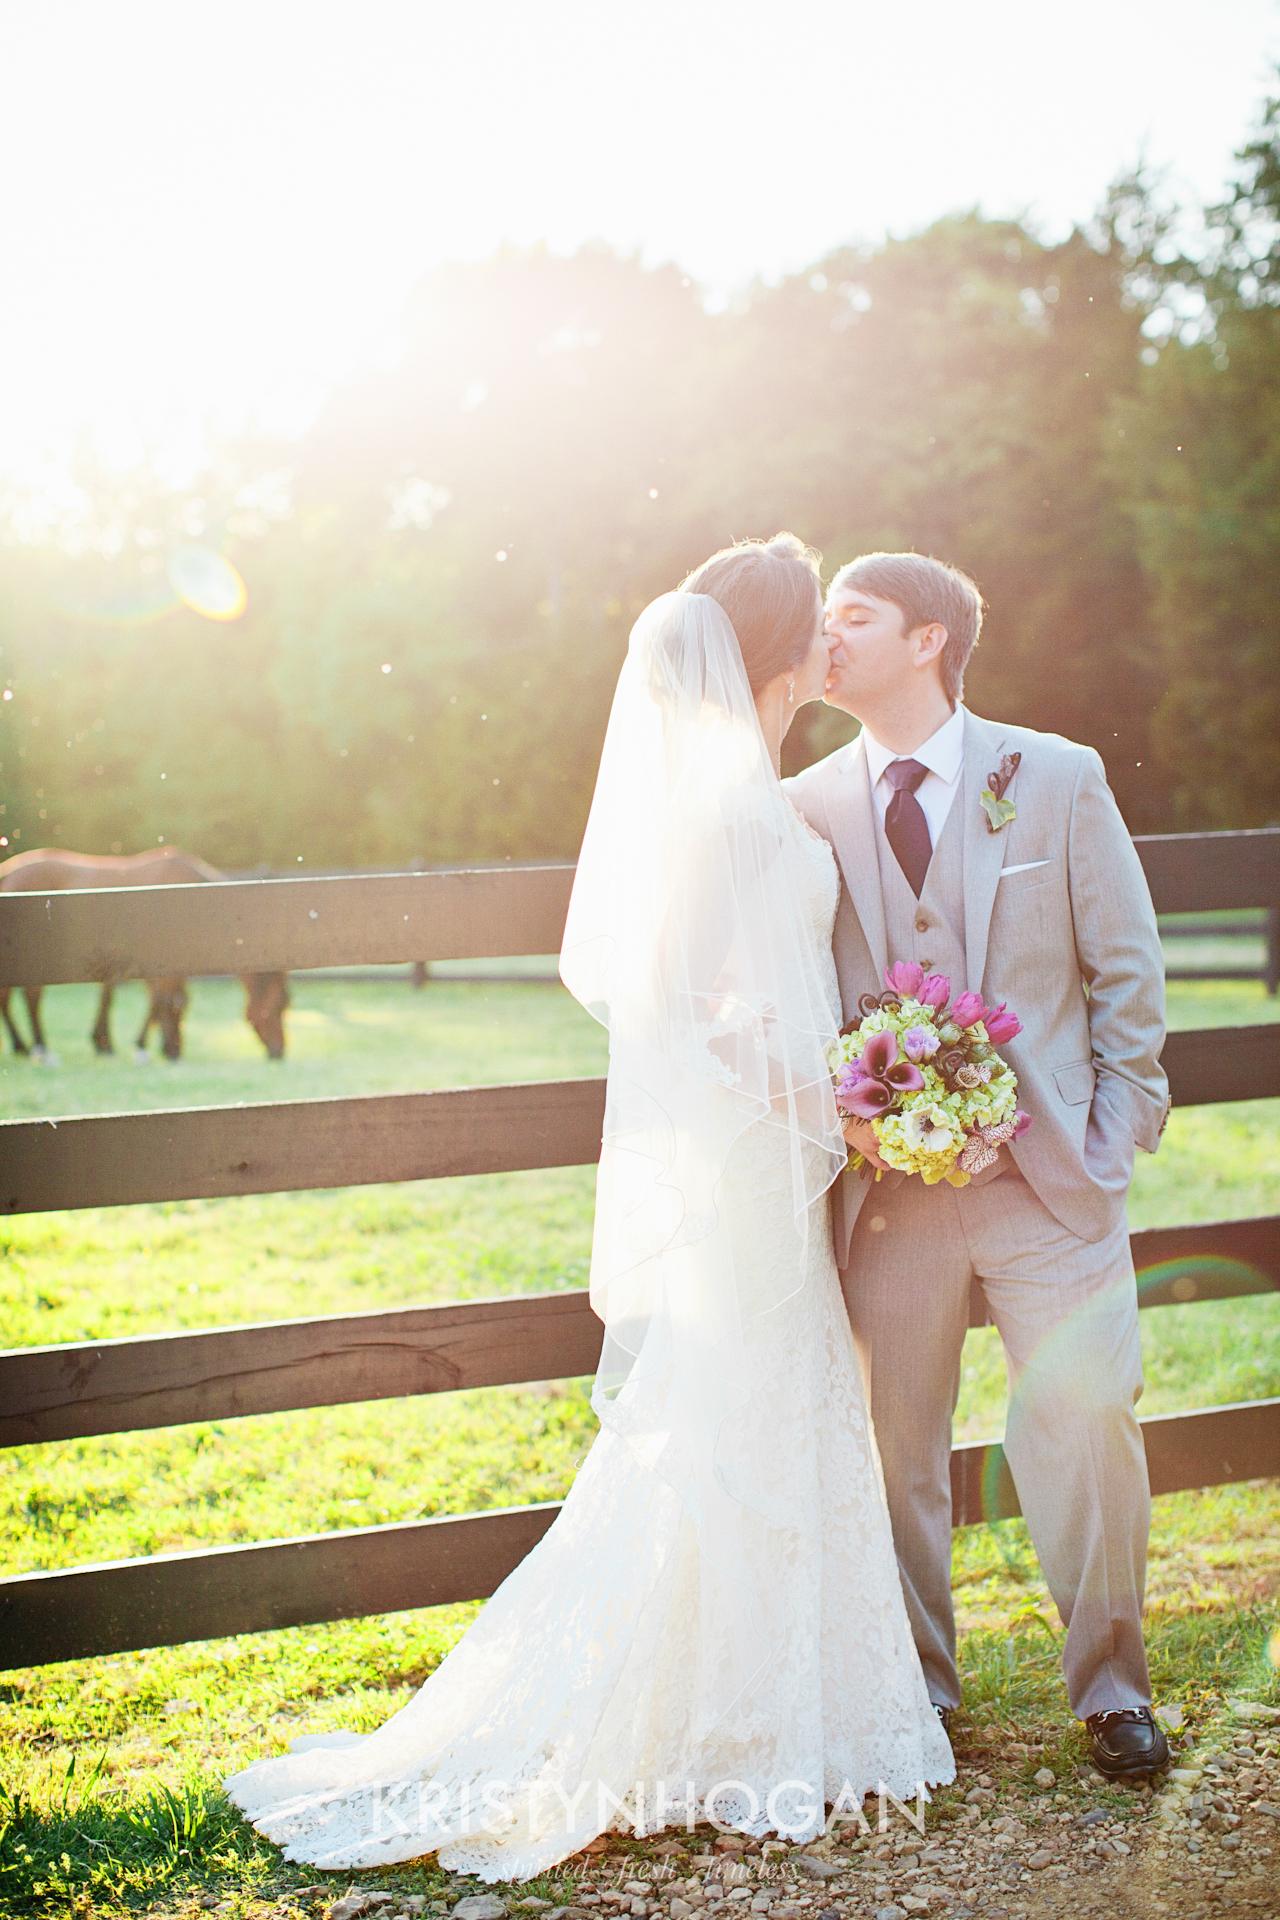 Nashville_Wedding_Photographer_Kristyn_Hogan_Samples_357.jpg